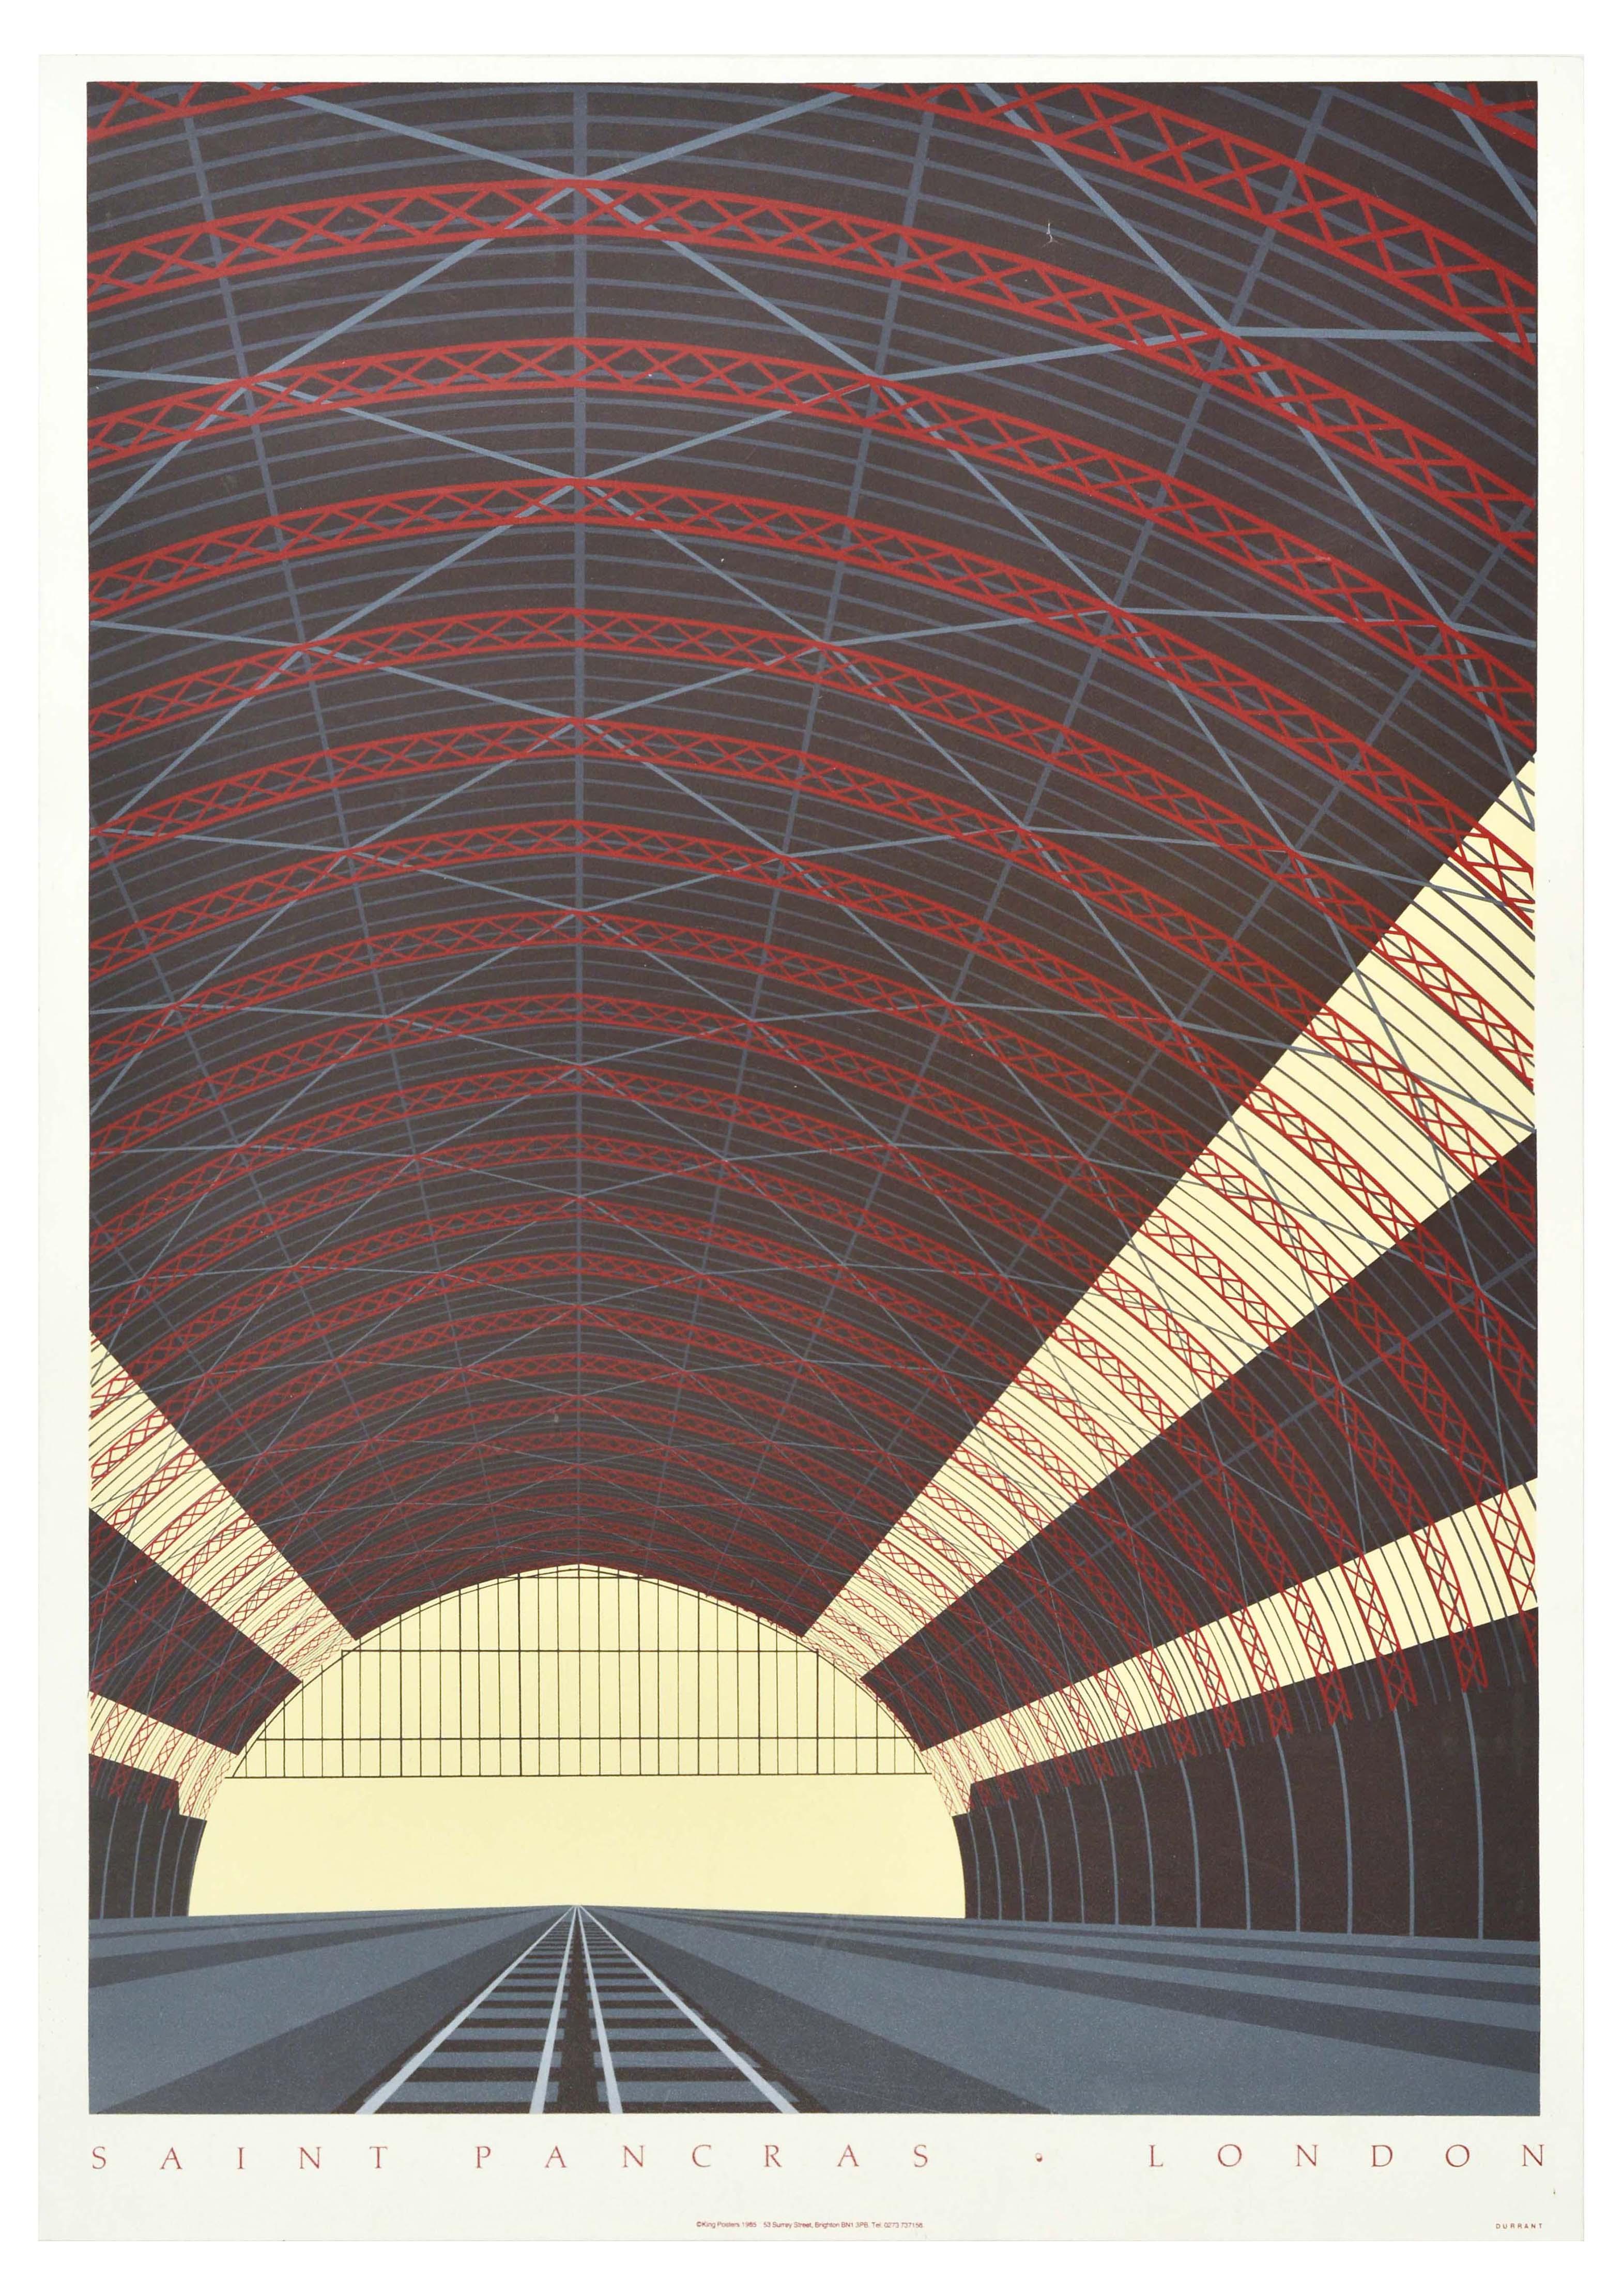 Travel Poster St Pancras London Railway Architecture